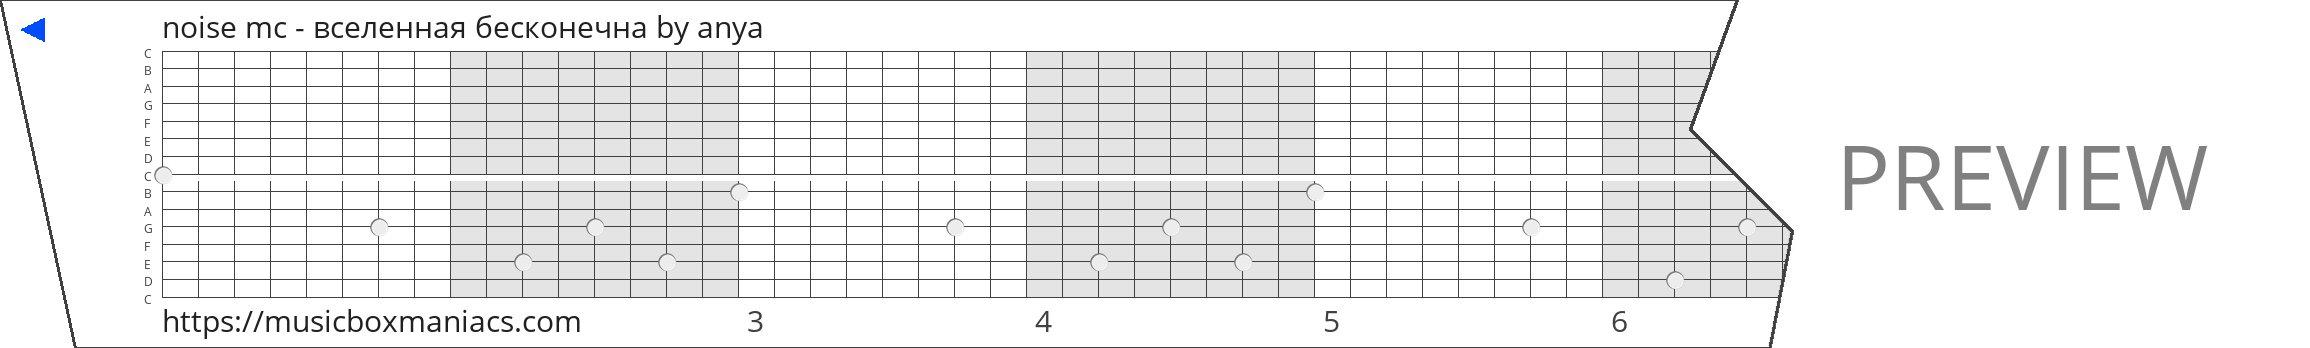 noise mc - вселенная бесконечна 15 note music box paper strip